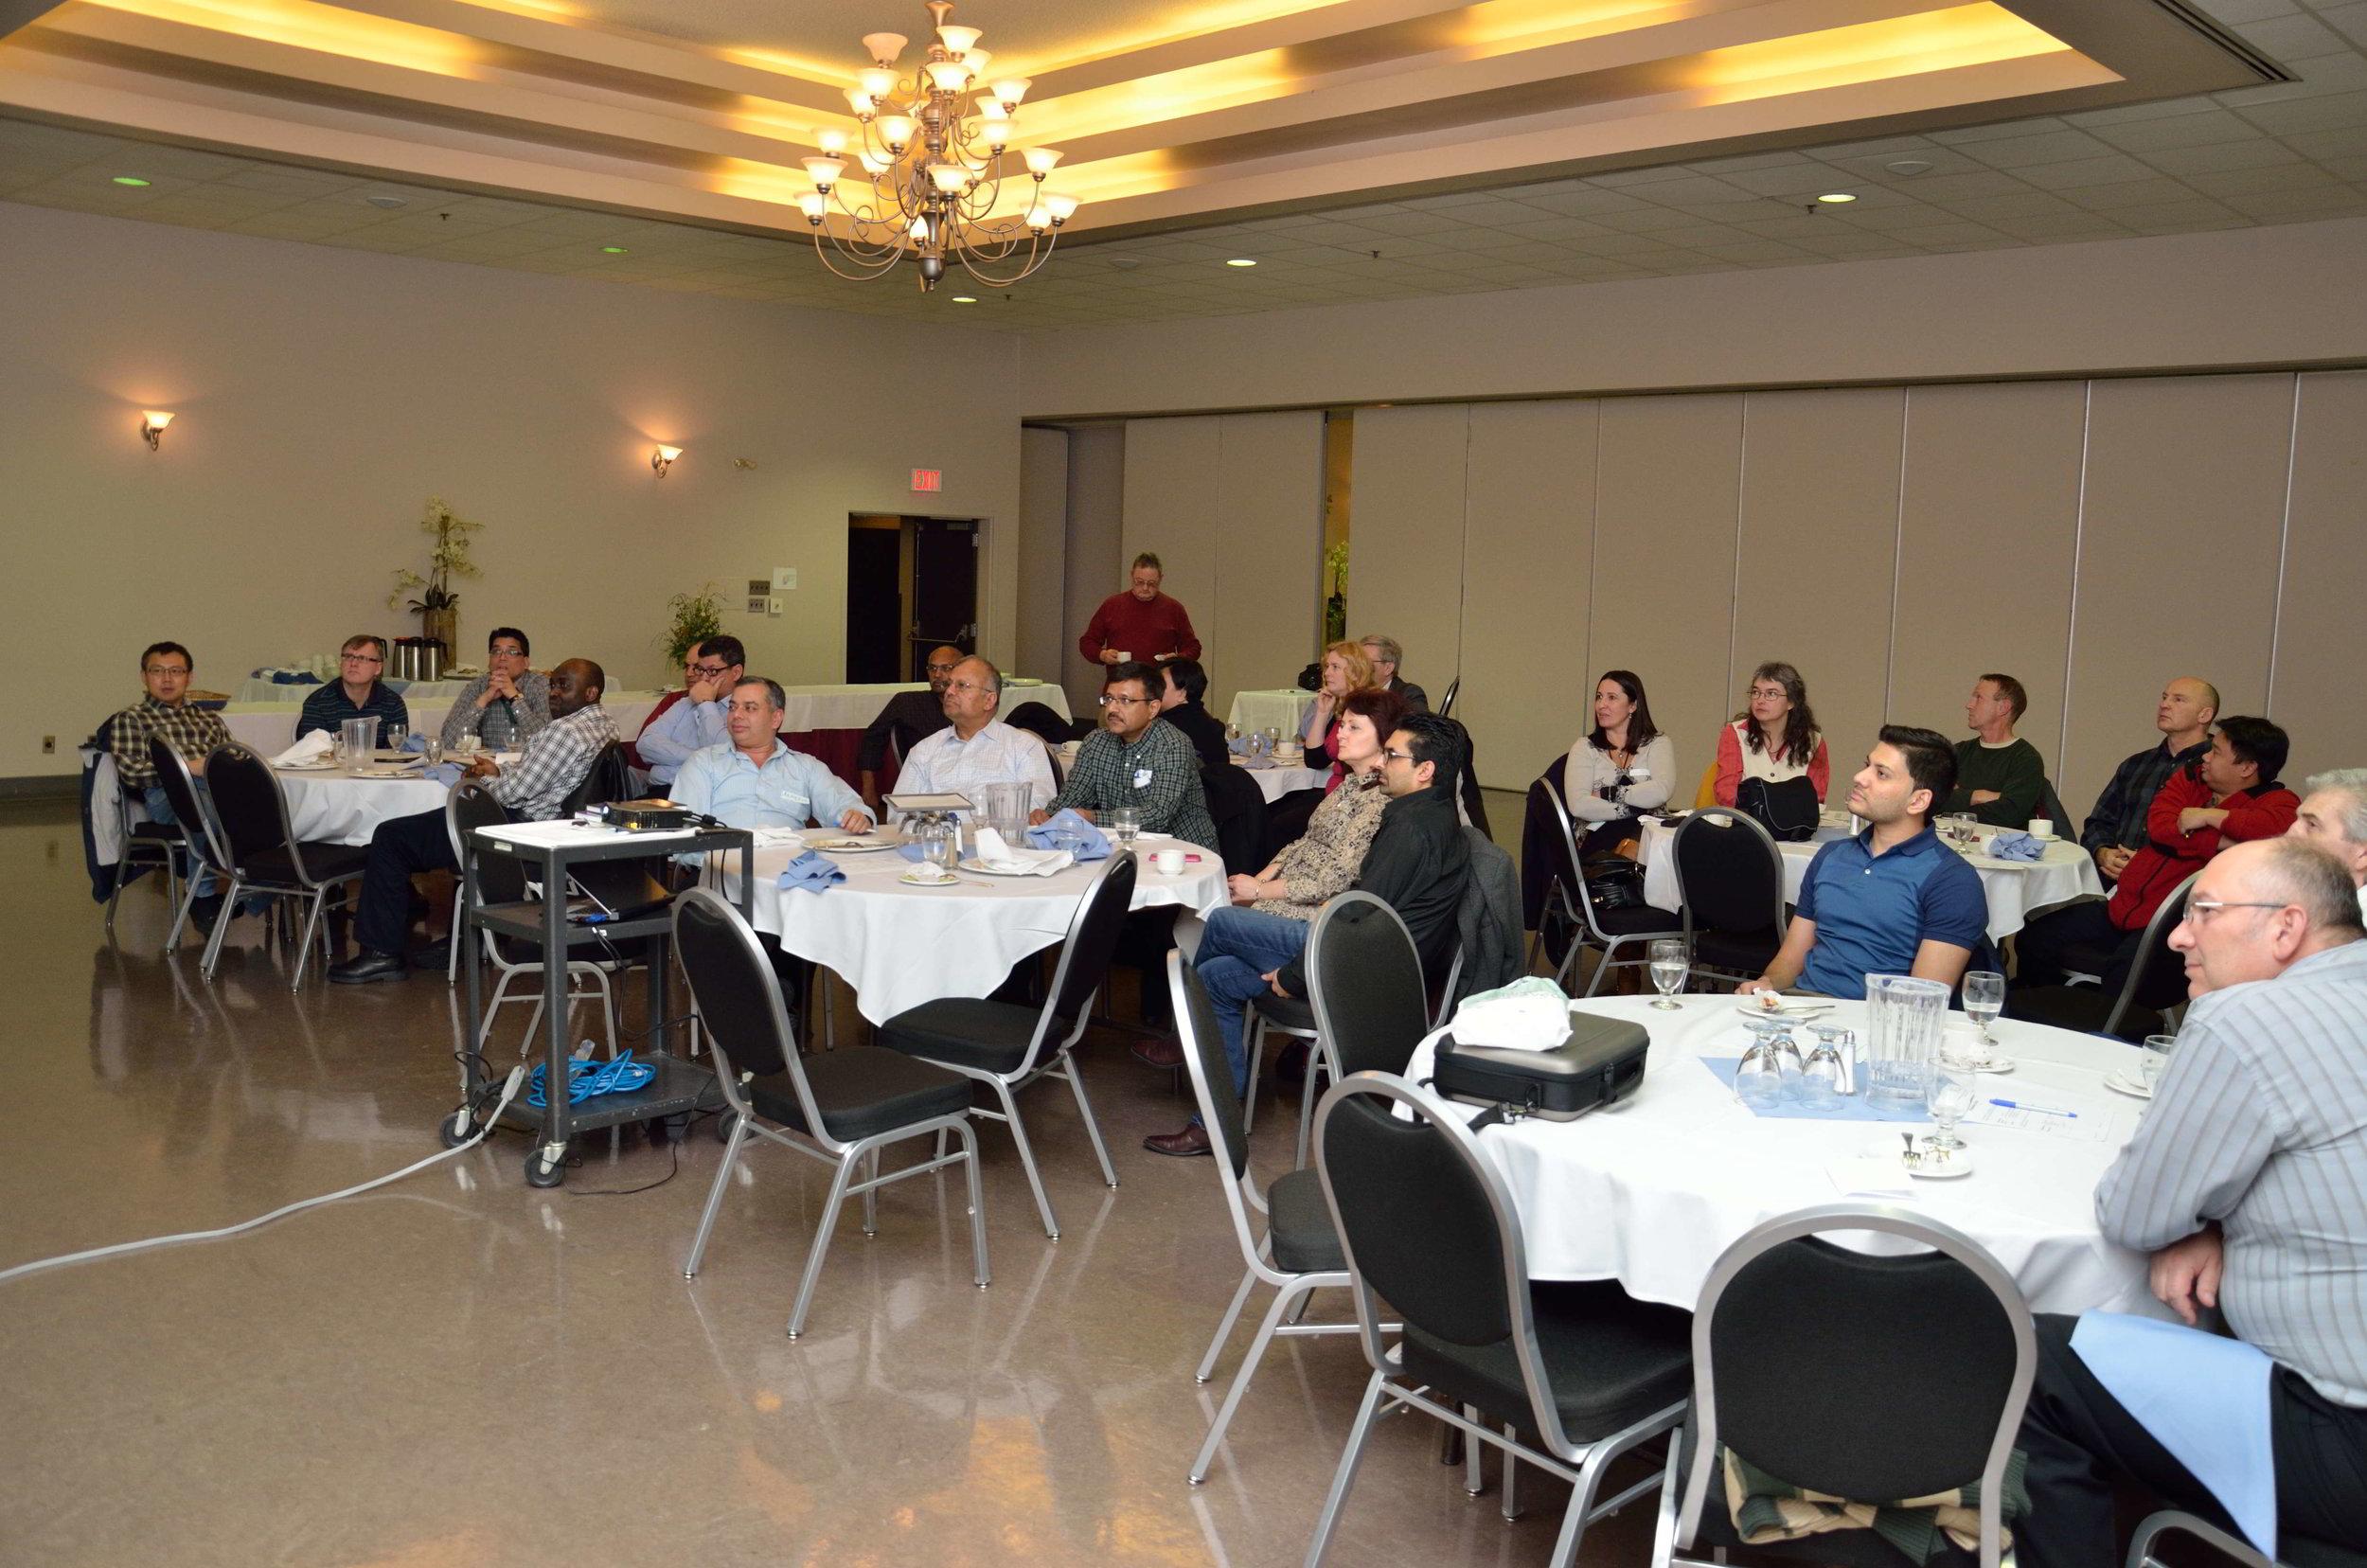 2015-01 January Dinner Meeting - Photo 4.jpg